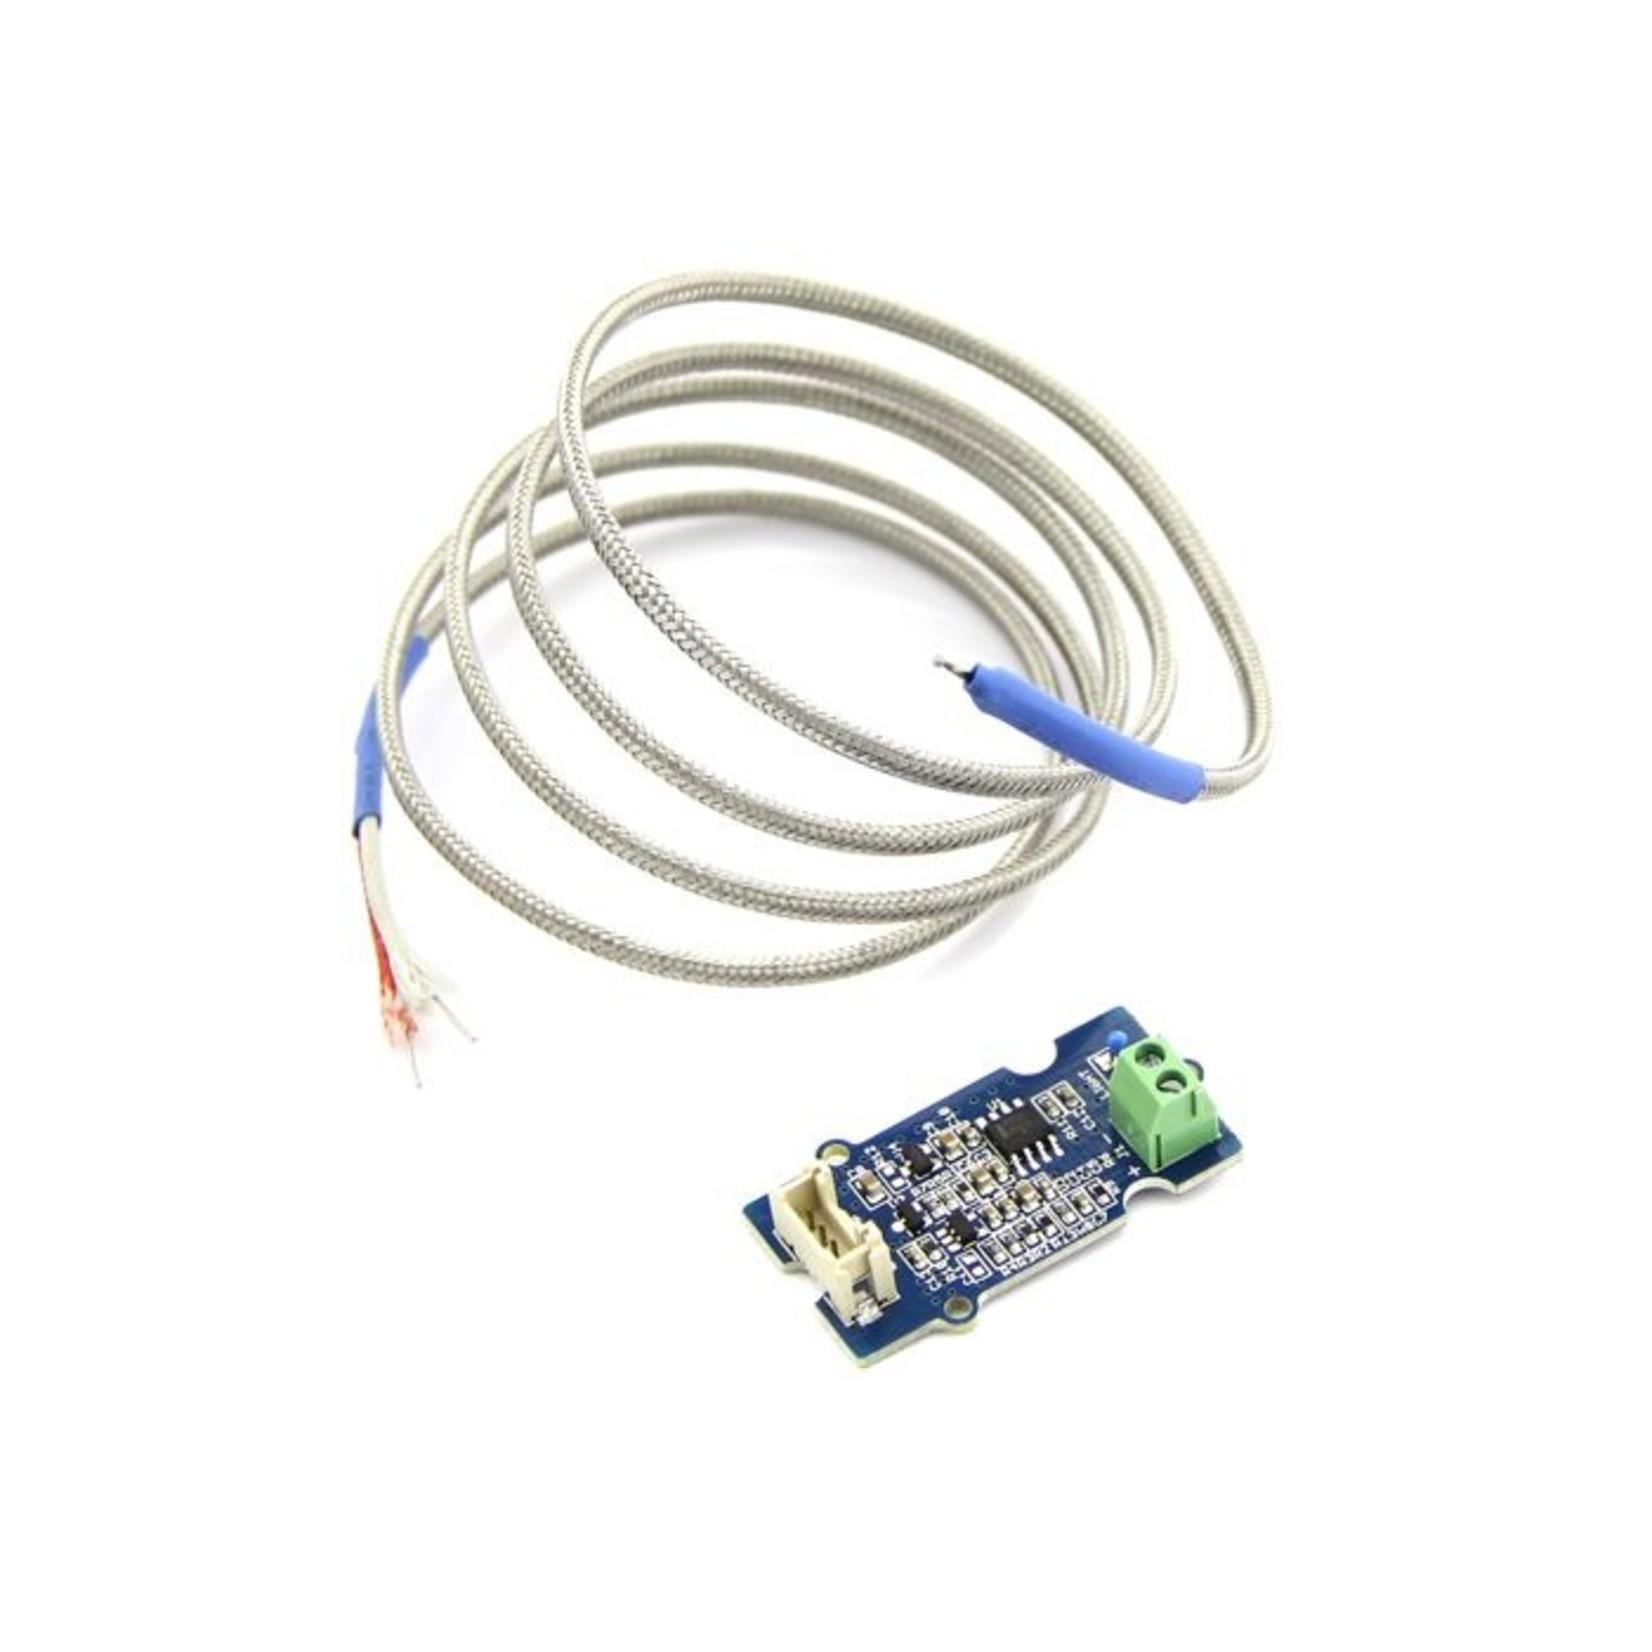 Seeed Grove - High Temperature Sensor